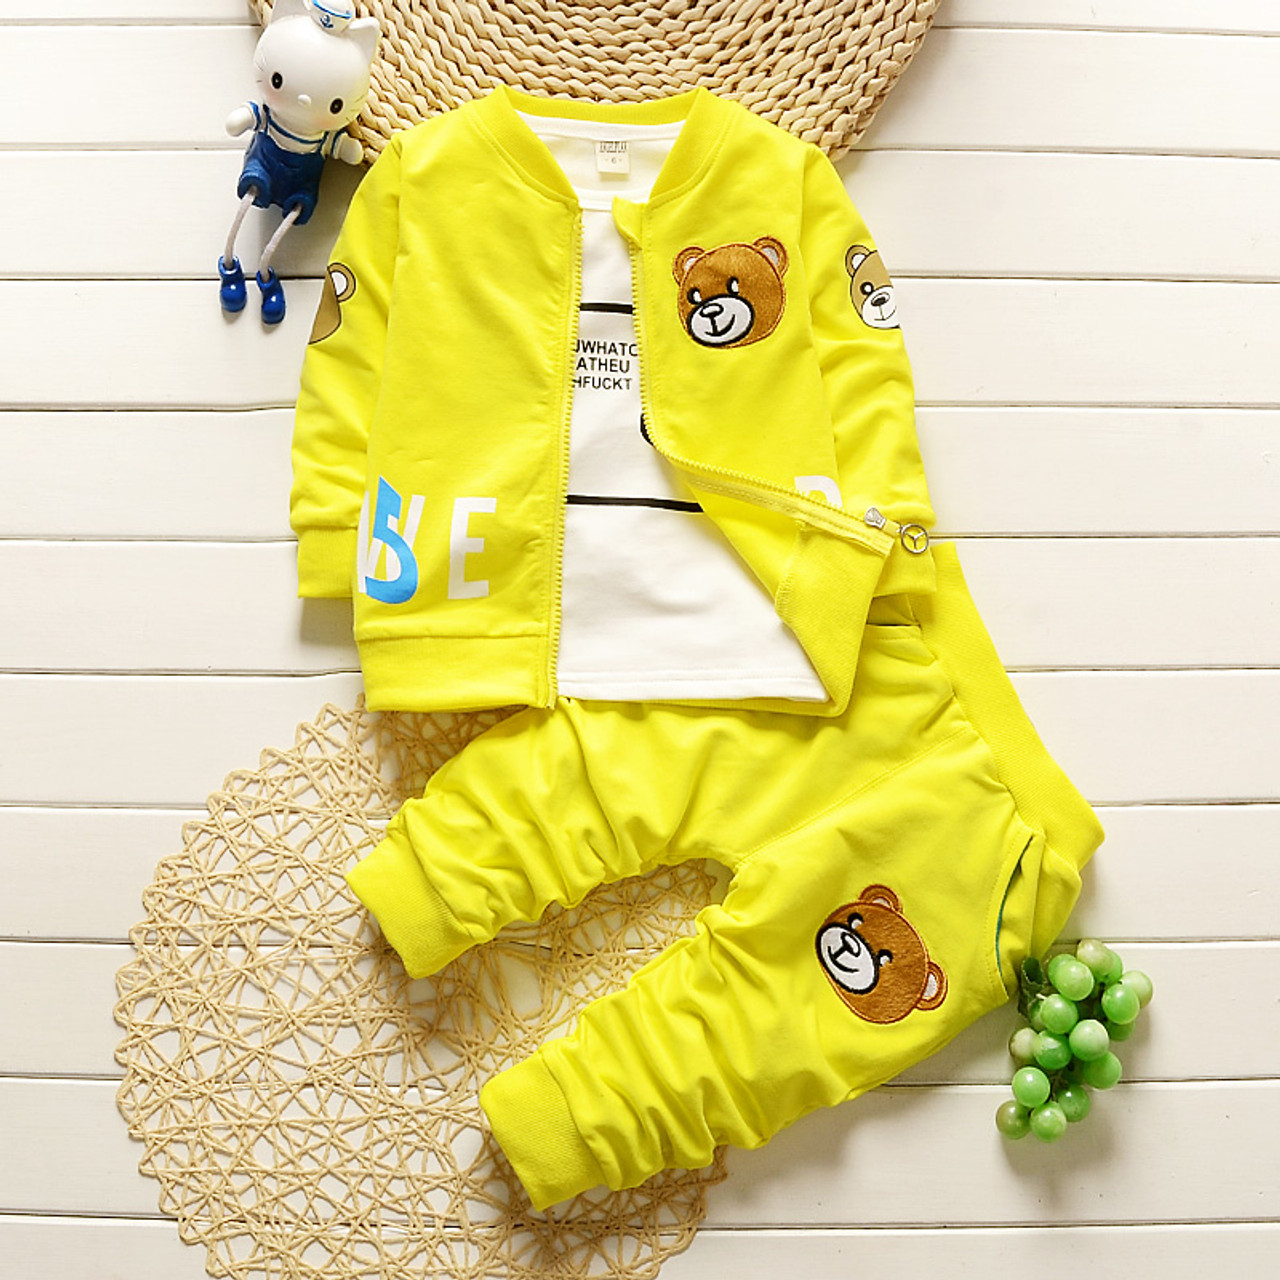 860bc2162 BibiCola baby boys clothing sets newborn boy coat + shirt +pants ...